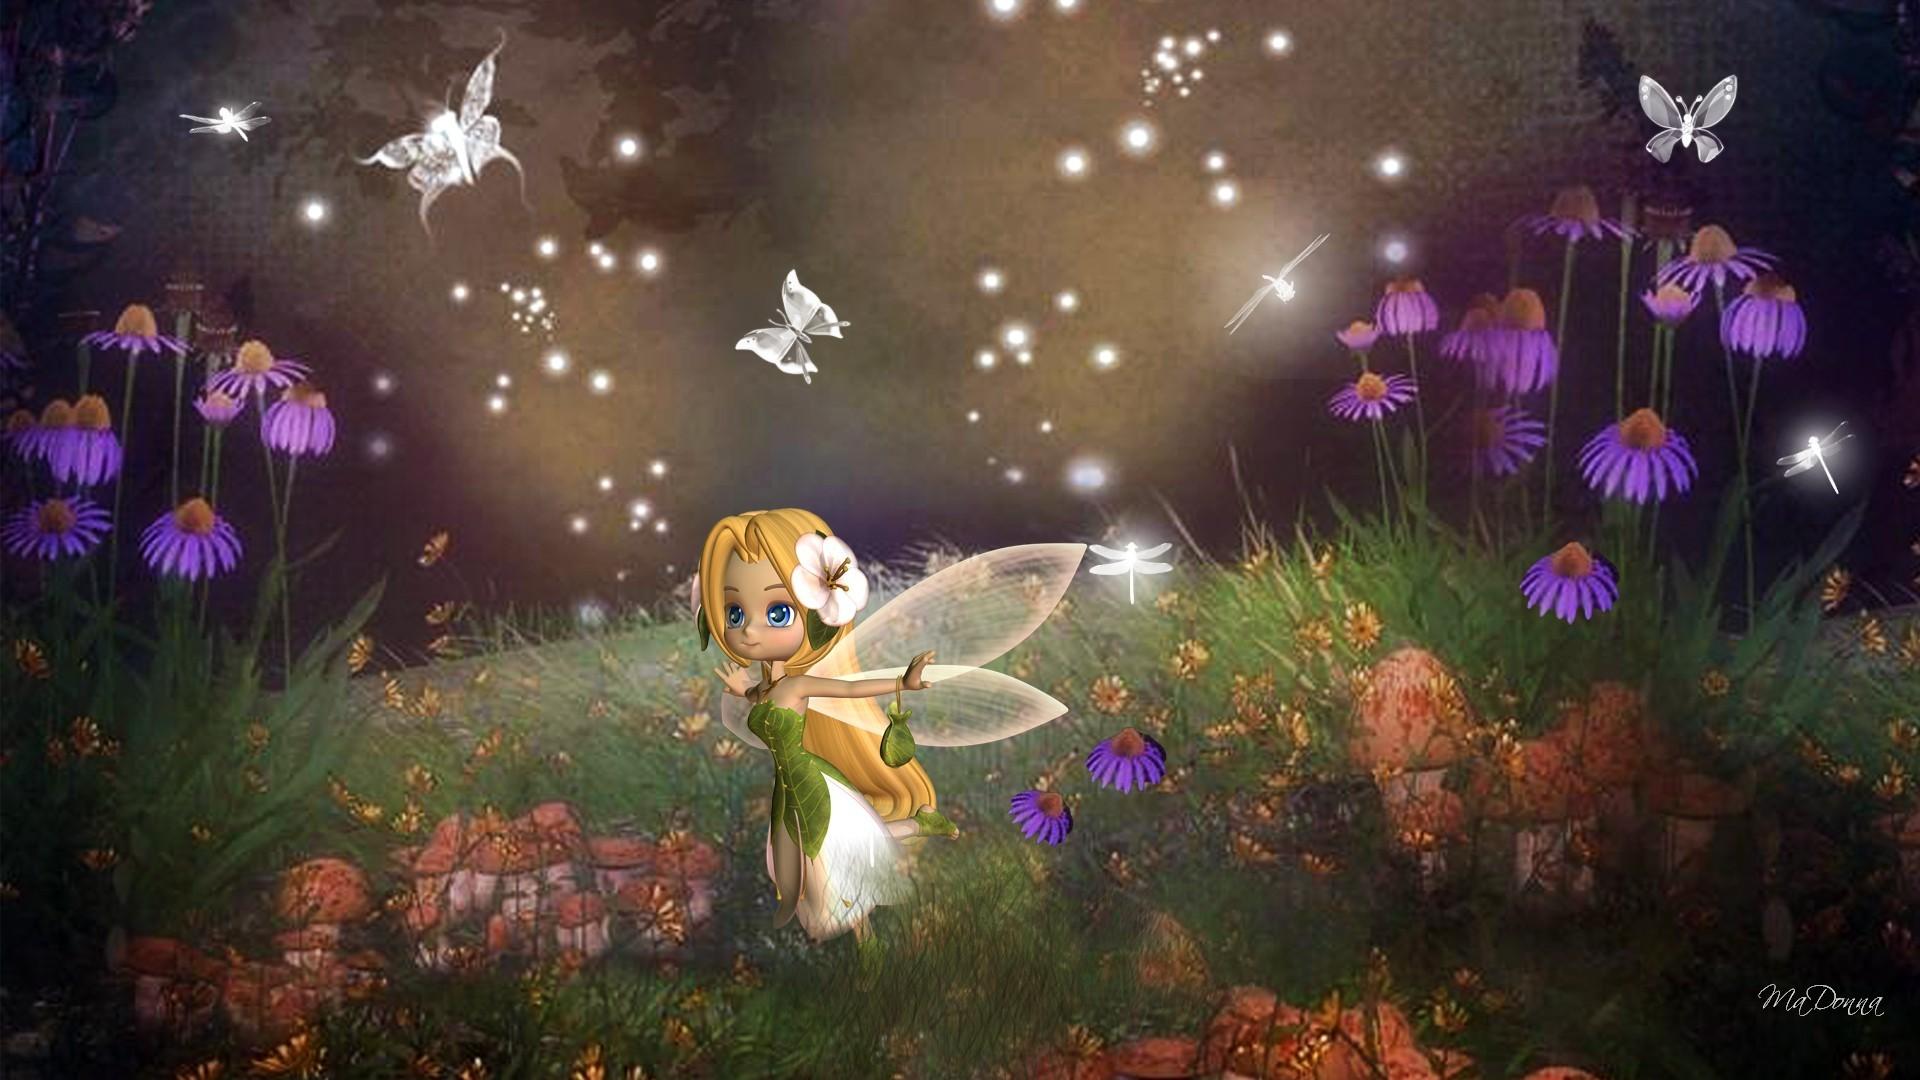 Beautiful fairies wallpapers - Free fairy wallpaper and screensavers ...